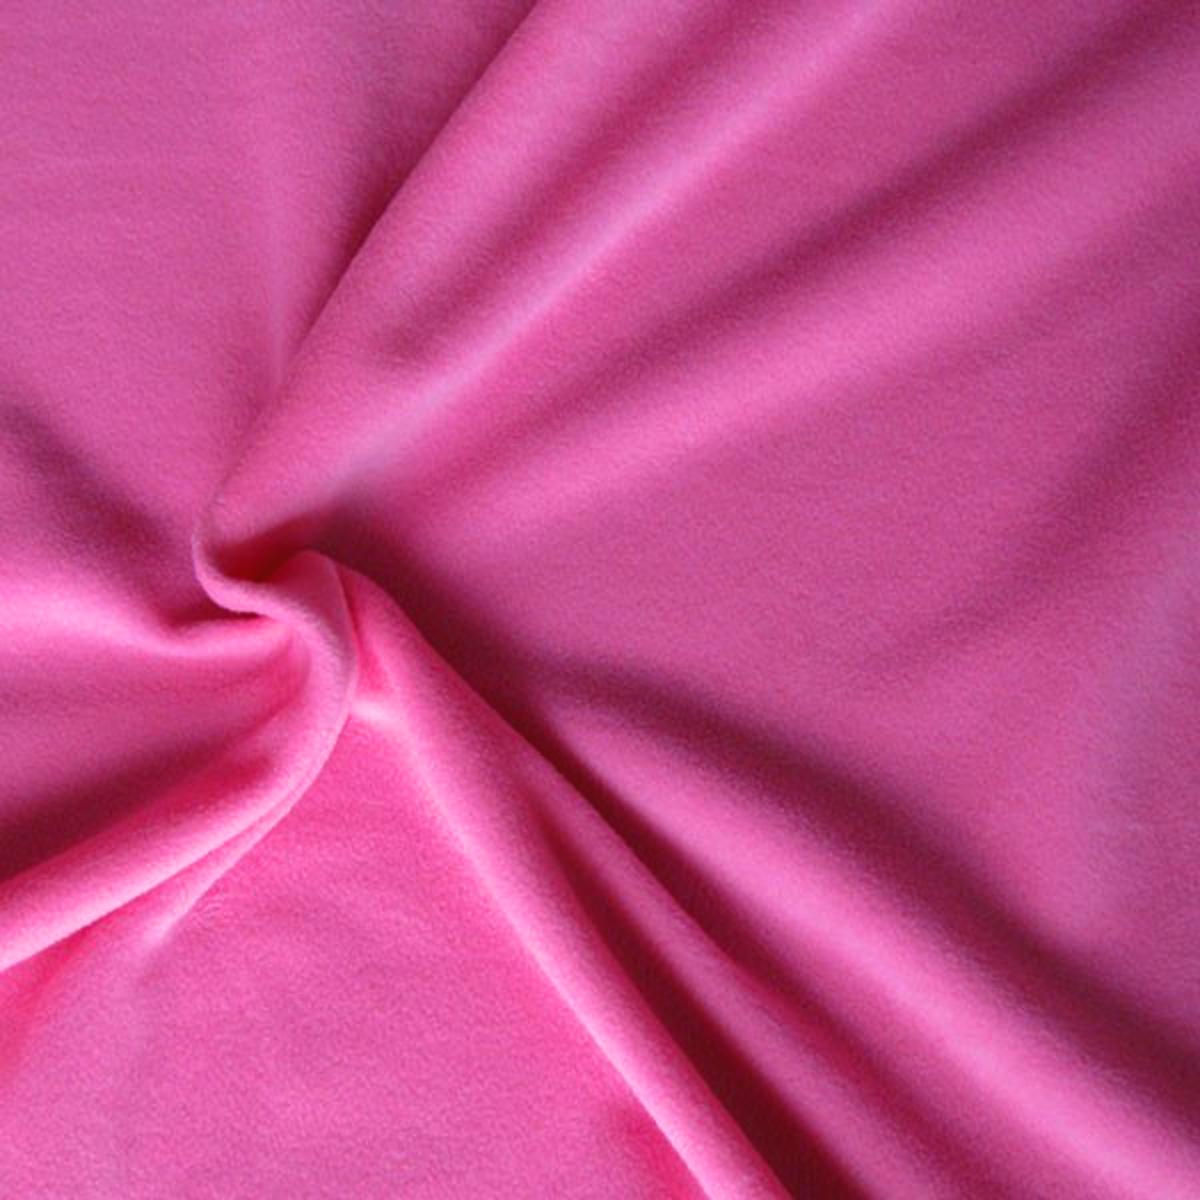 polar fleece stoffe fleece meterware antipilling pink alle stoffe stoffe uni fleece. Black Bedroom Furniture Sets. Home Design Ideas